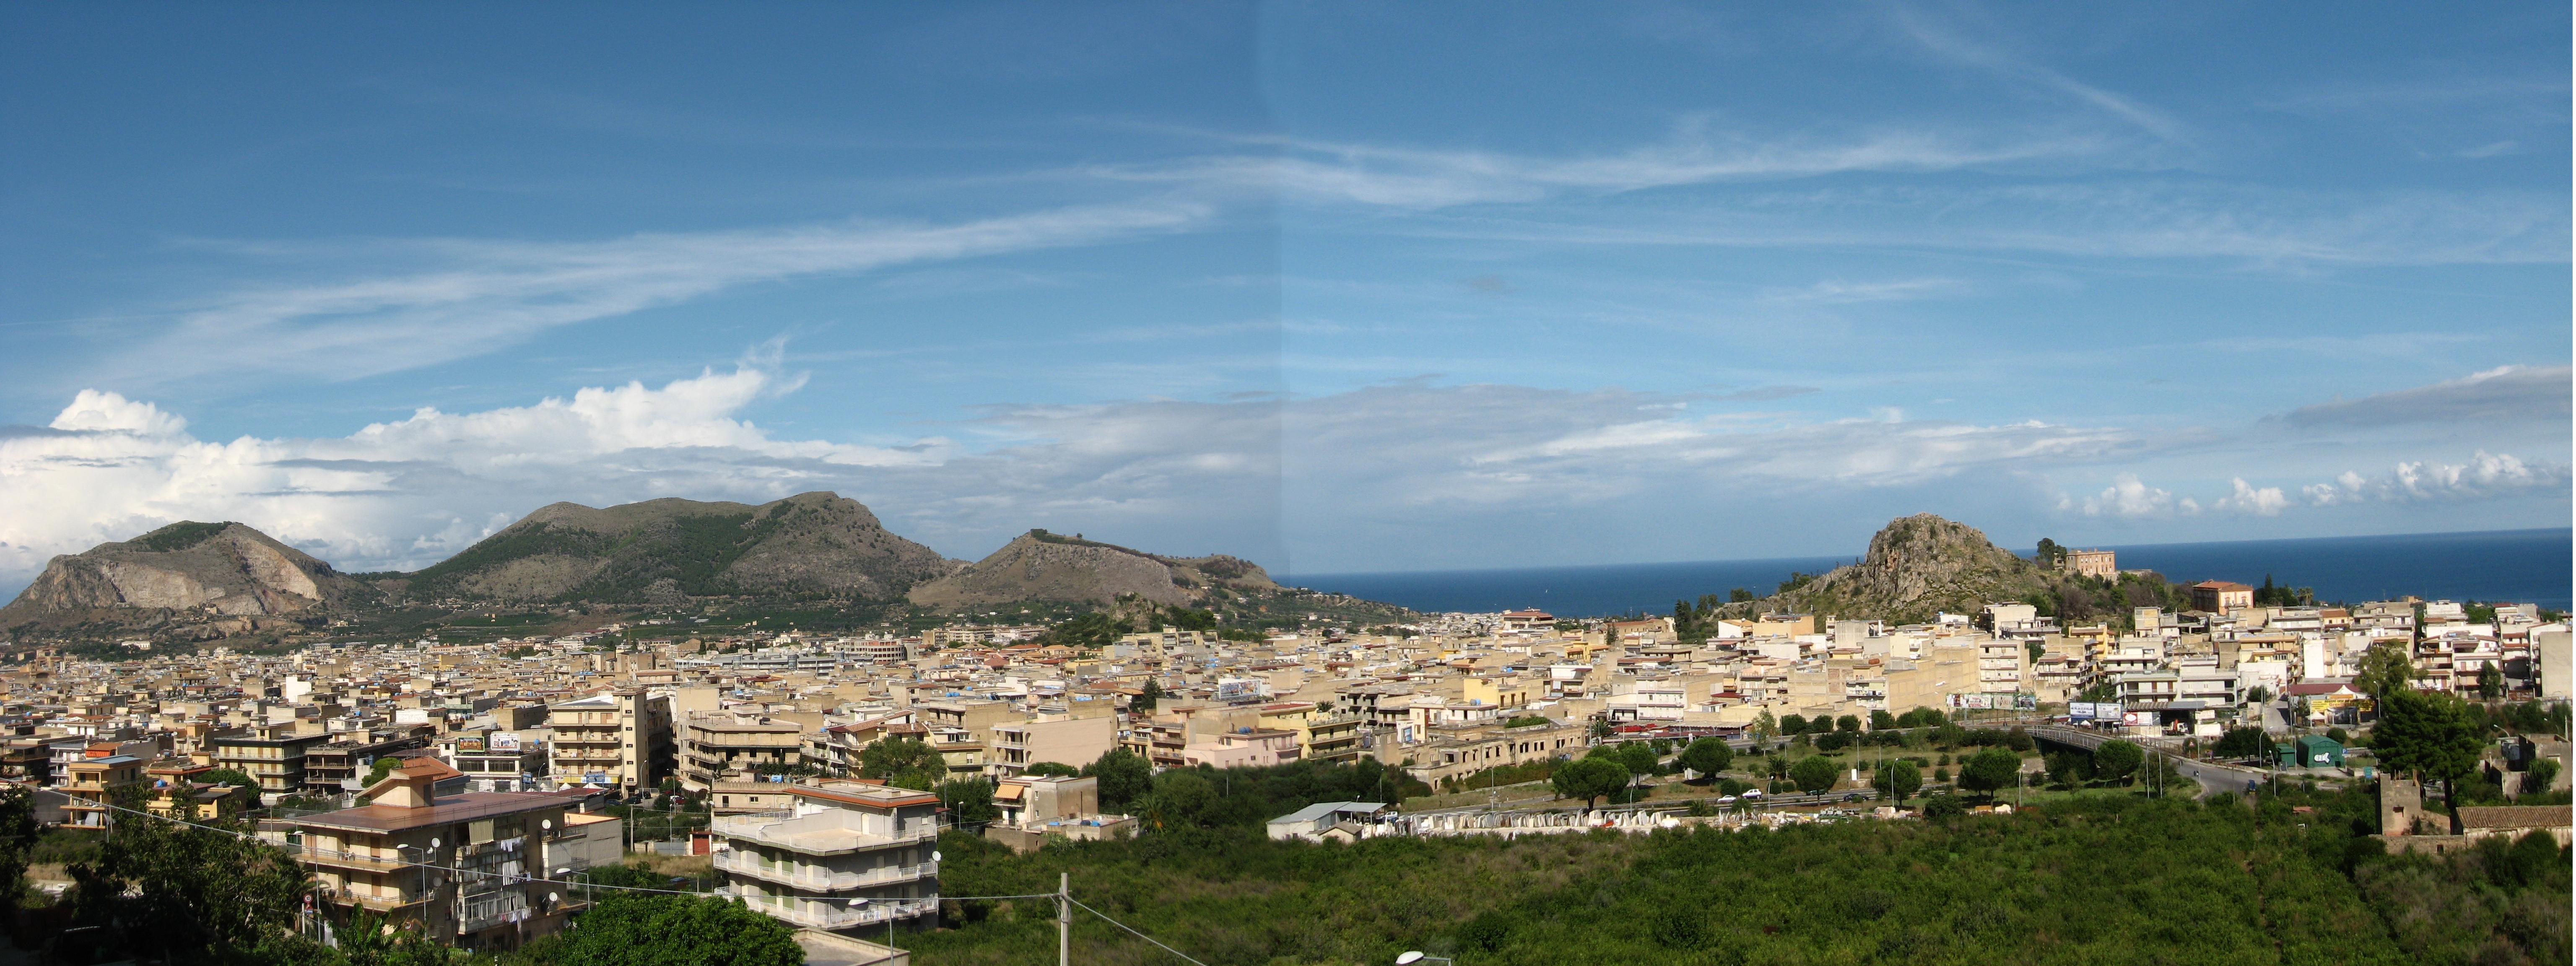 Giuseppe Castelli-Bagheria, a város, melynek díszpolgára Ennio Morricone